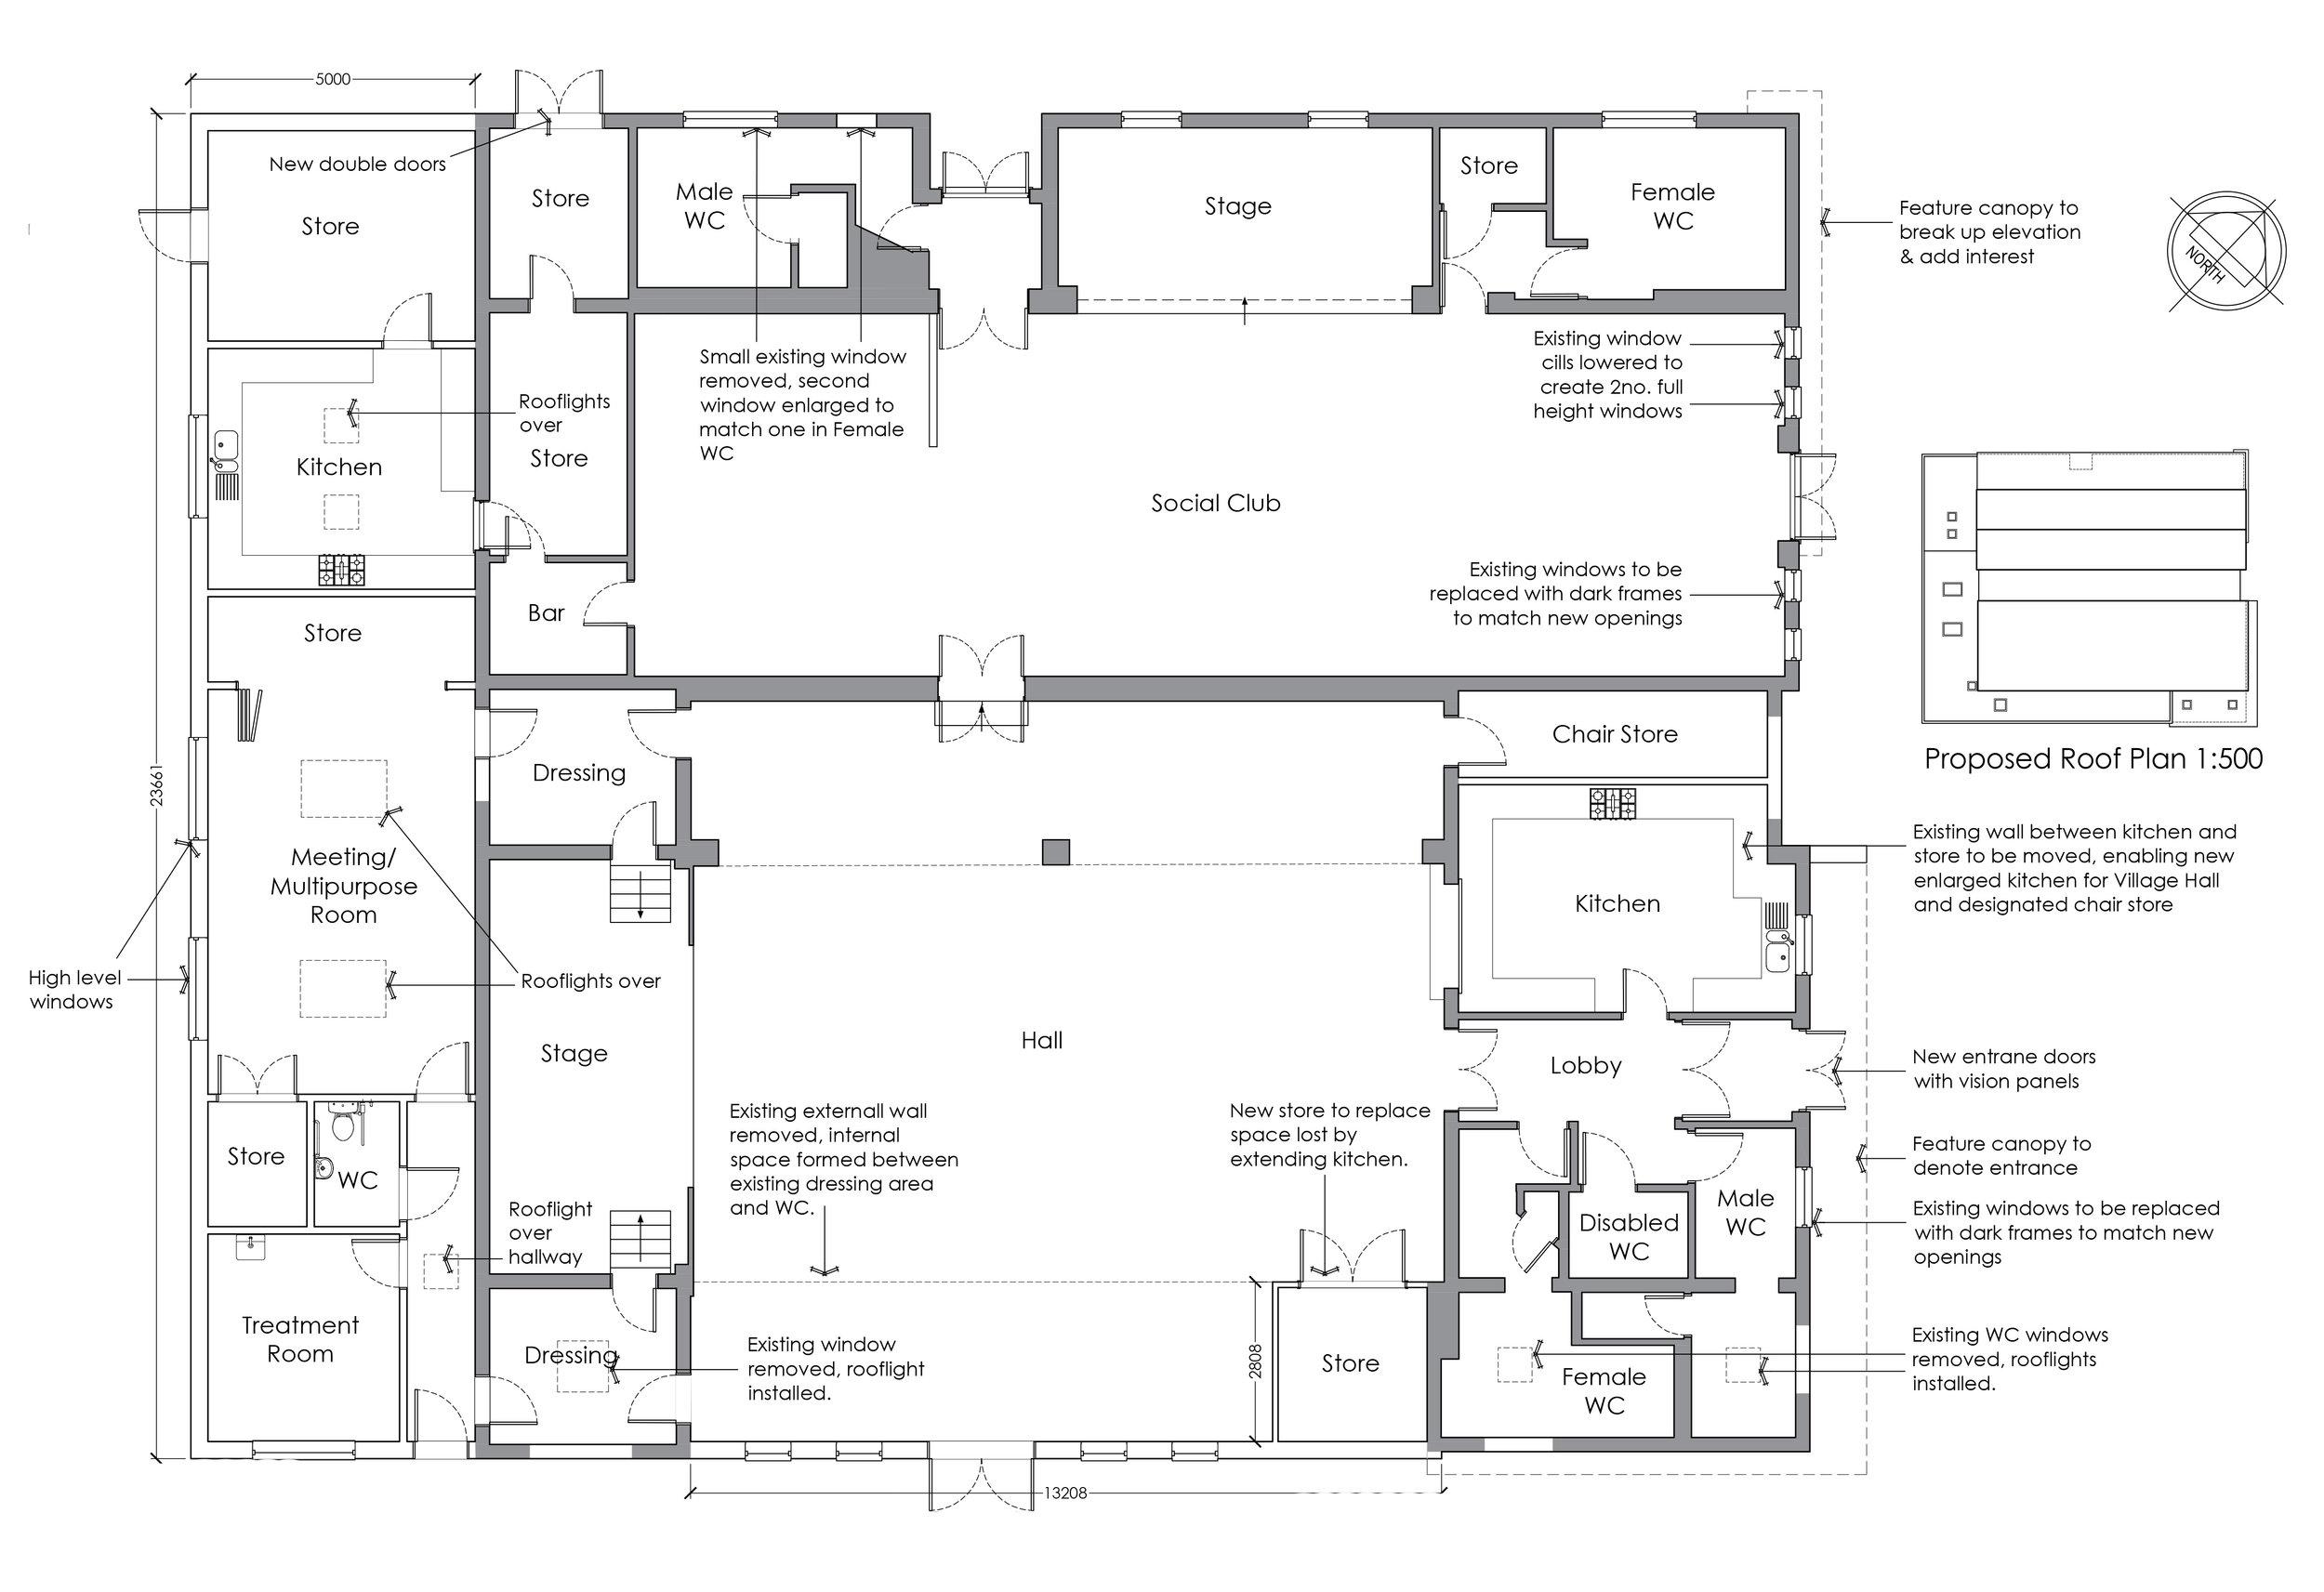 P16-086-02-03-001 Proposed Floor Plan-A3.jpg